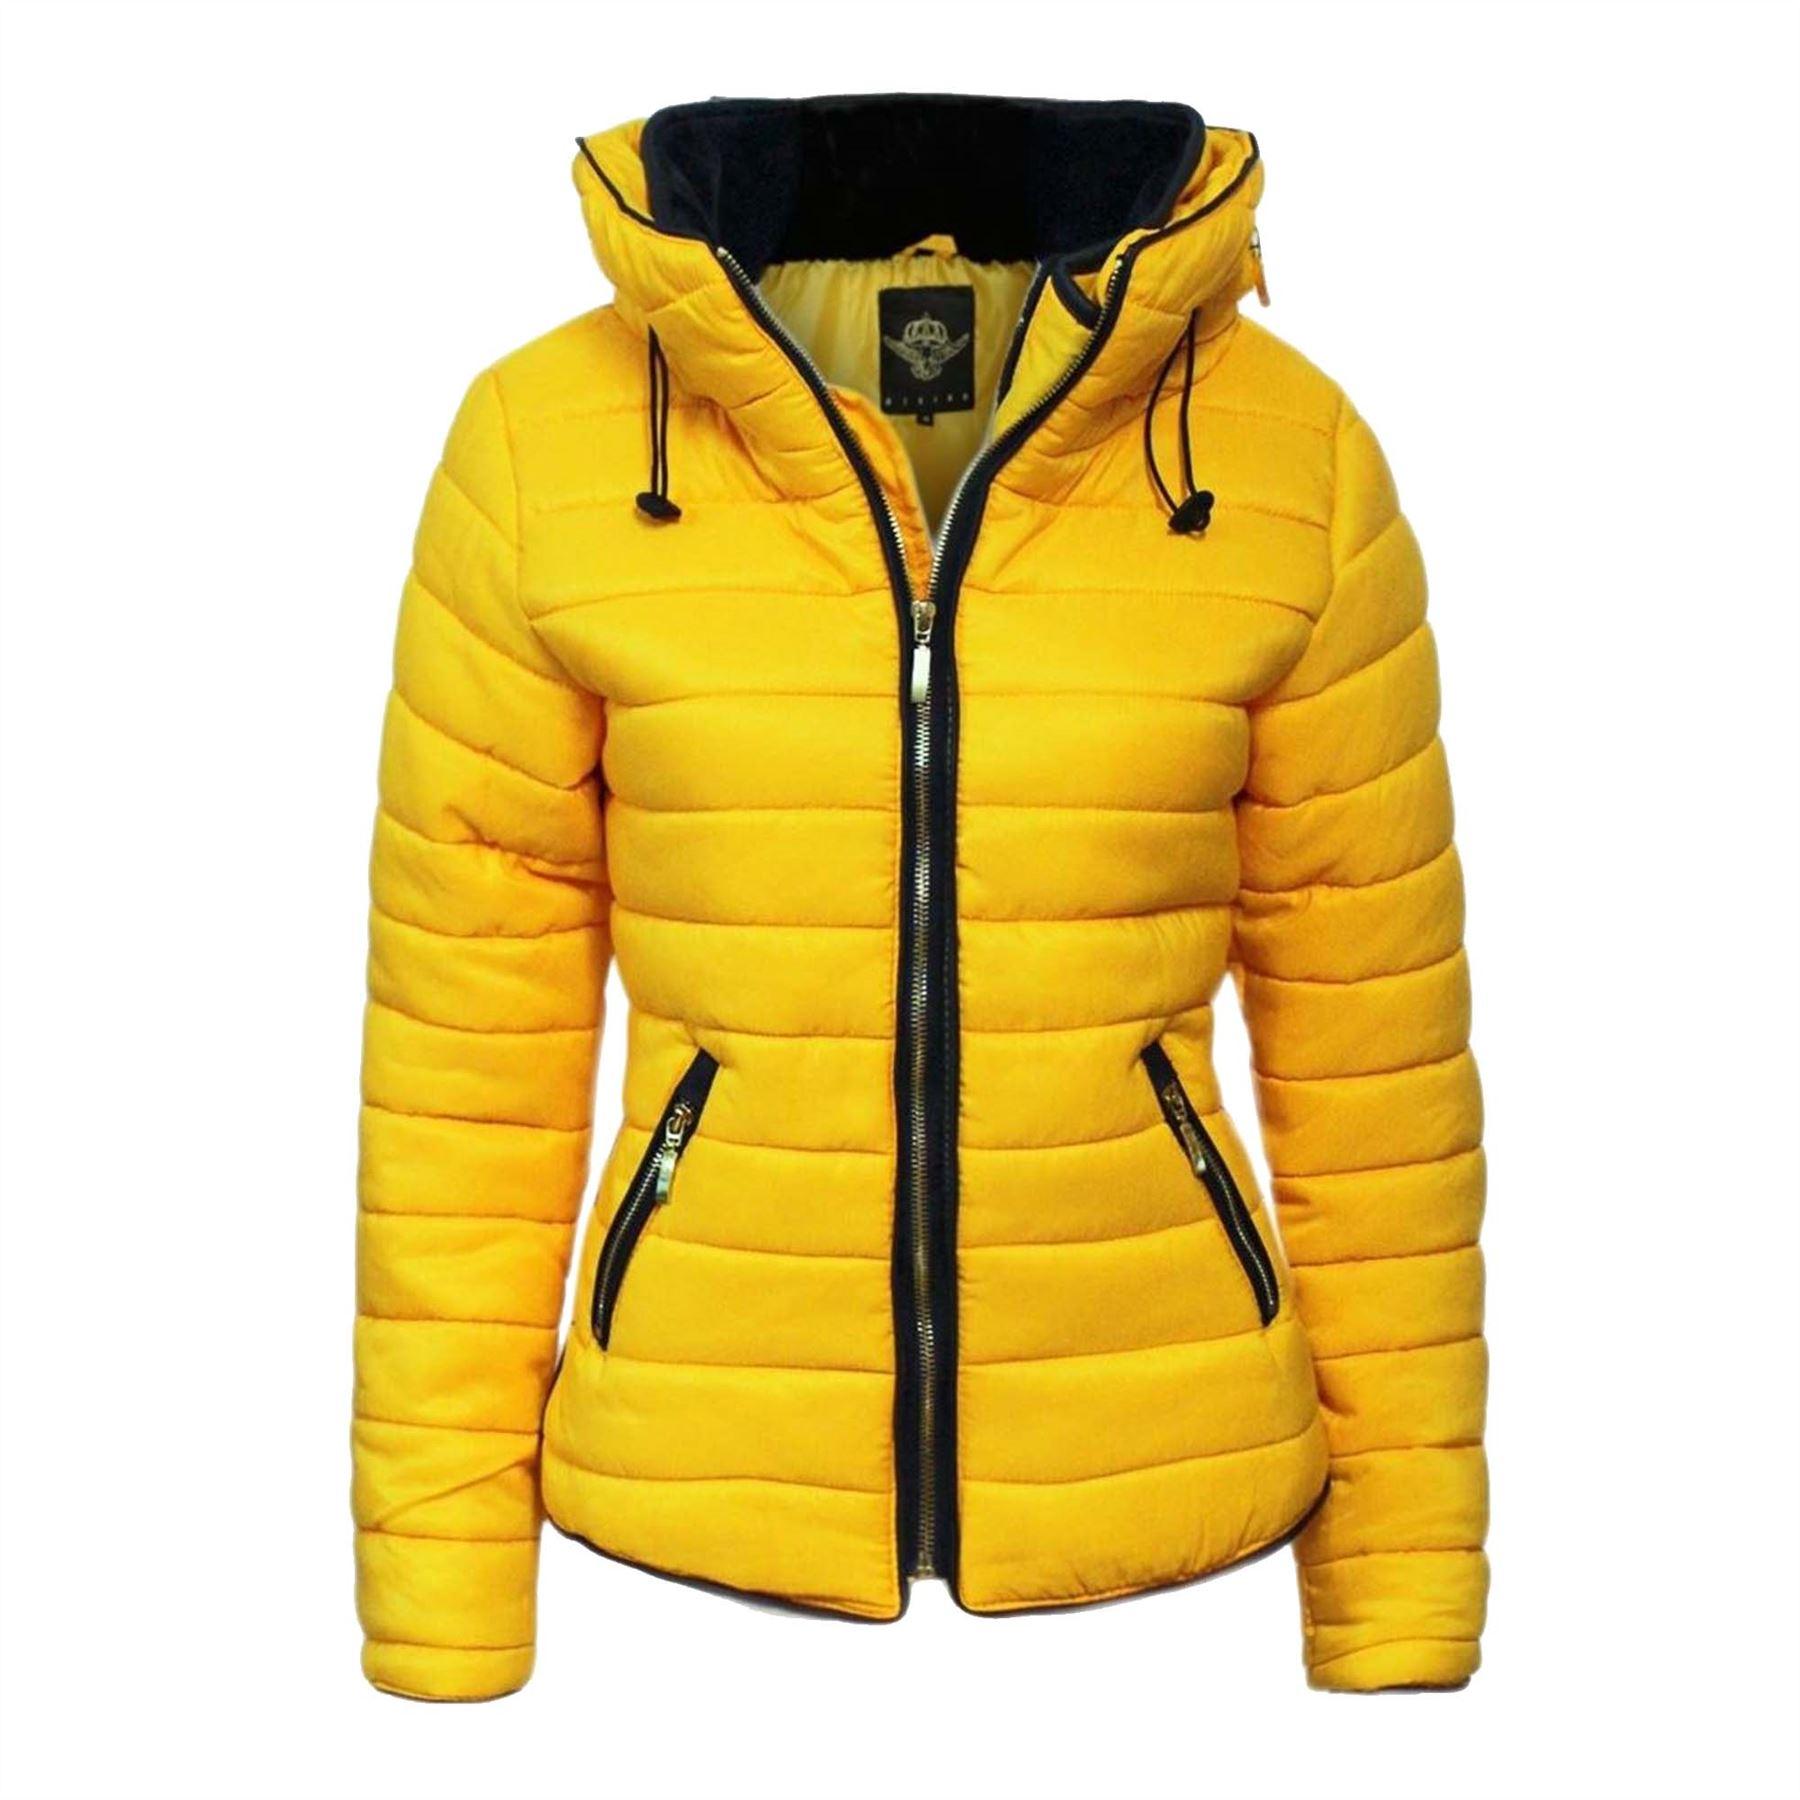 Bubble coats for women